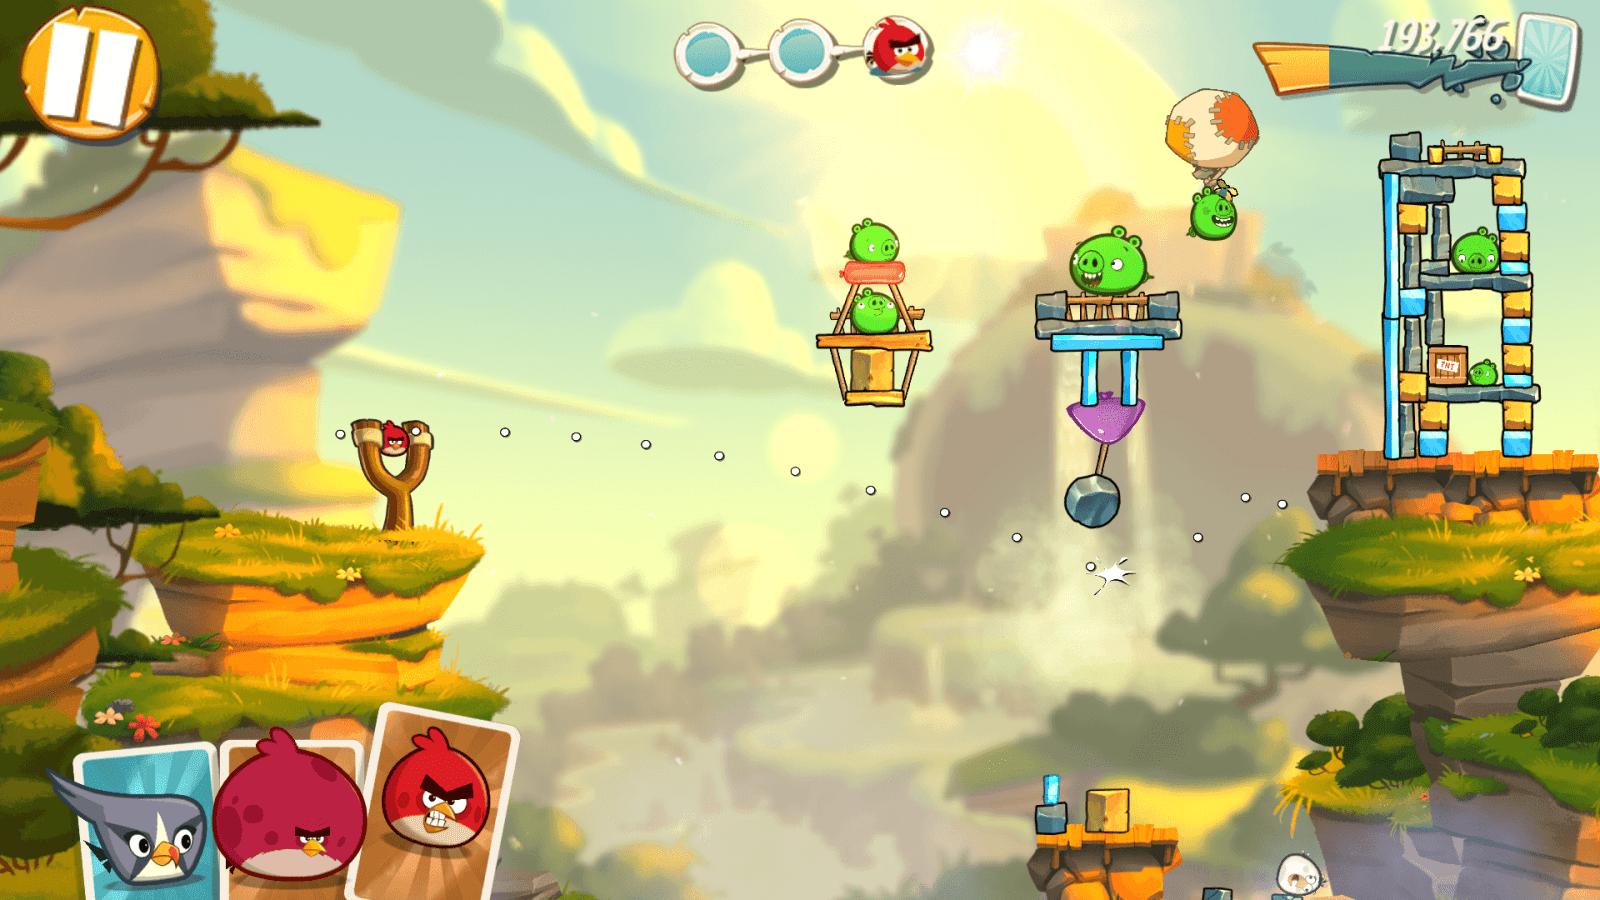 Screenshot 2015 08 19 23 21 54 - Обзор Angry Birds 2